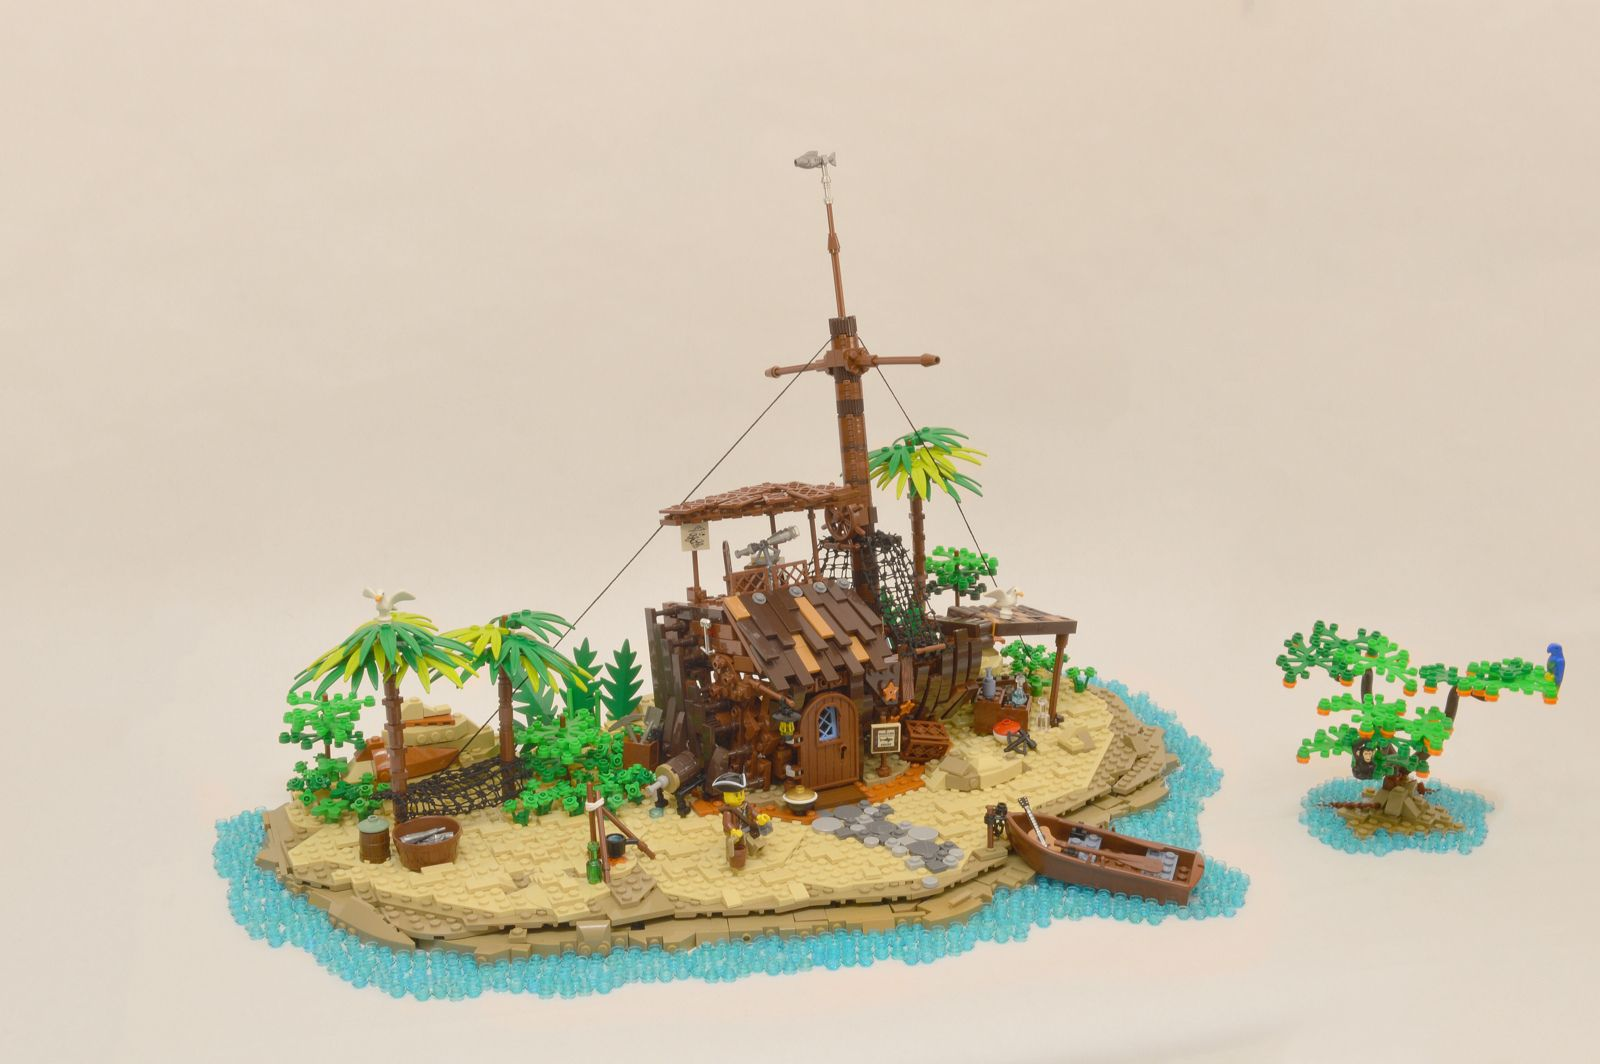 Shipwreck Island Cool Lego Creations Pirate Lego Lego Pirate Ship